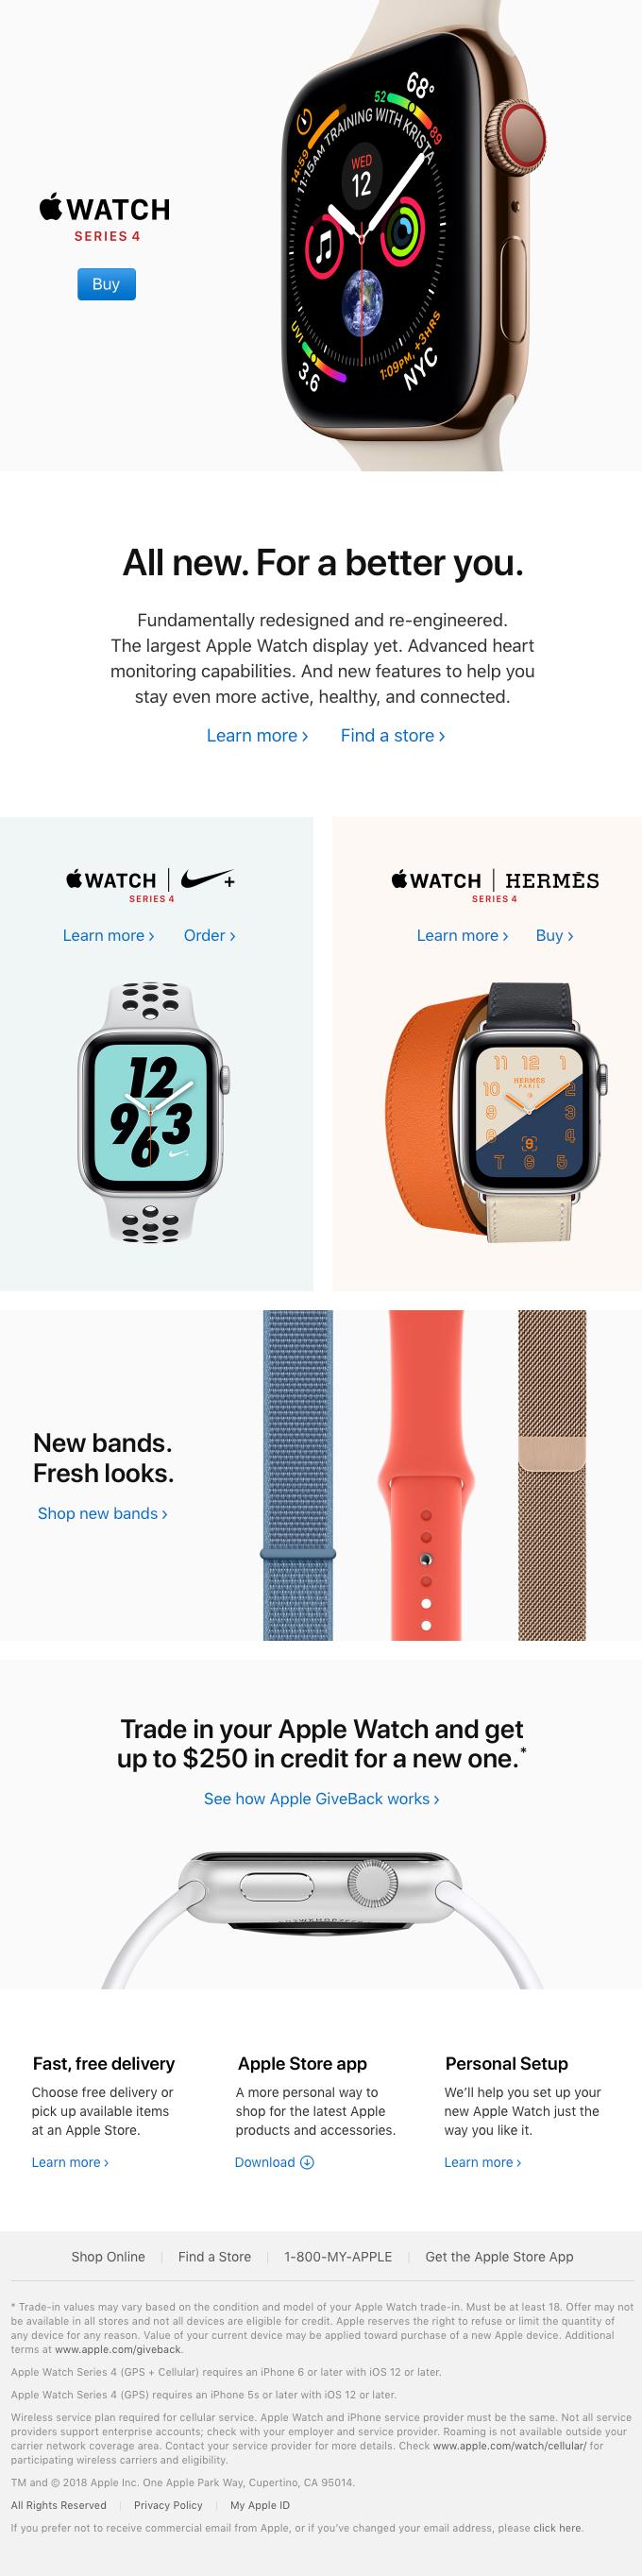 Apple Watch Series 4 is here.